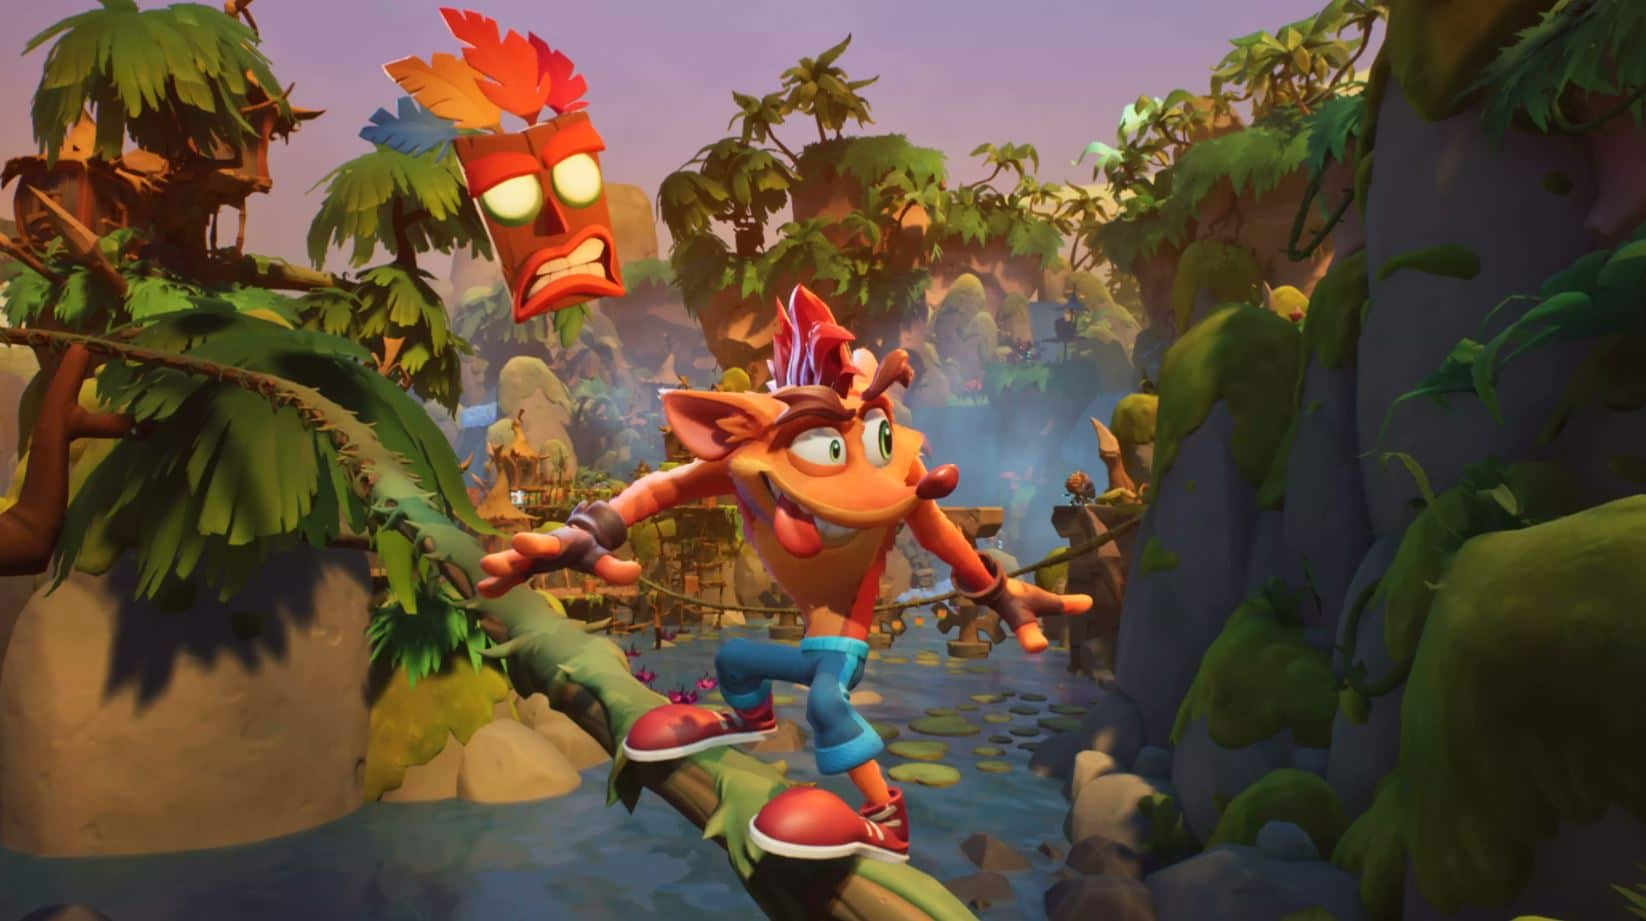 crash-bandicoot-4-screenshots-look-utter